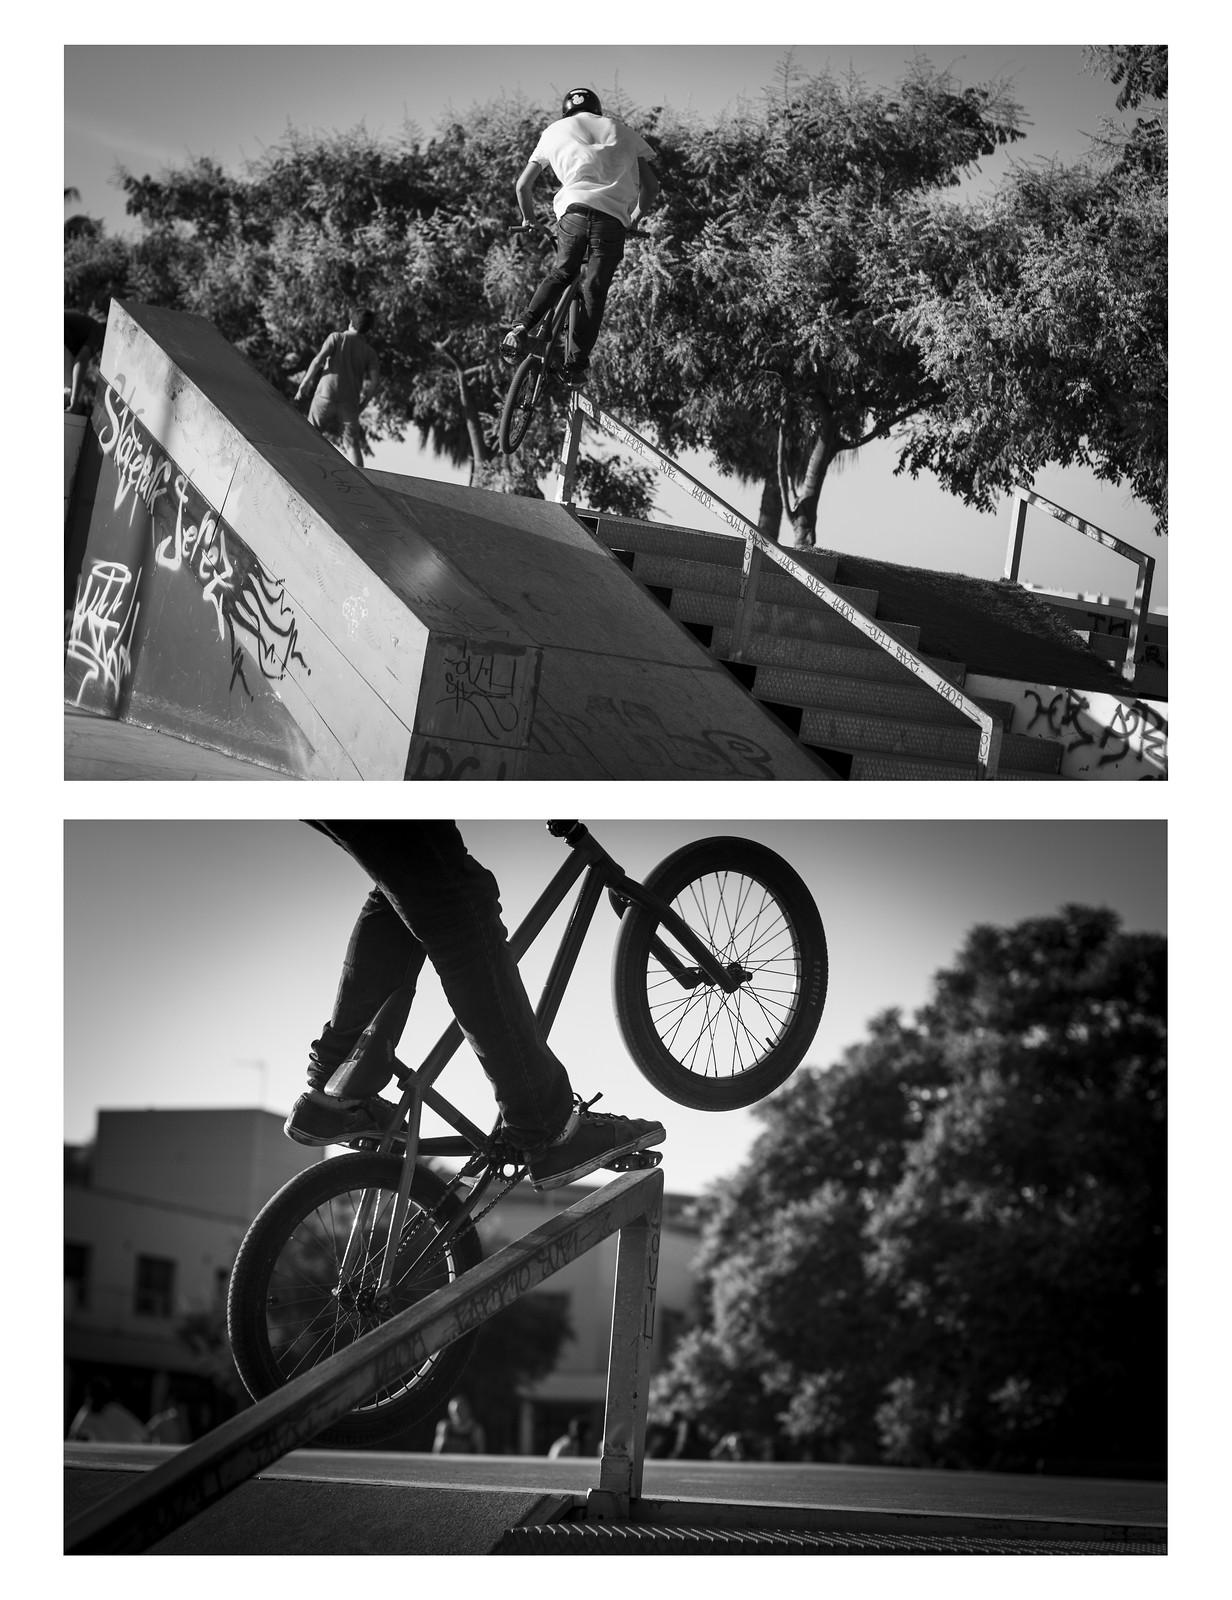 Olmedo pedal grind - angel8bits - Mountain Biking Pictures - Vital MTB